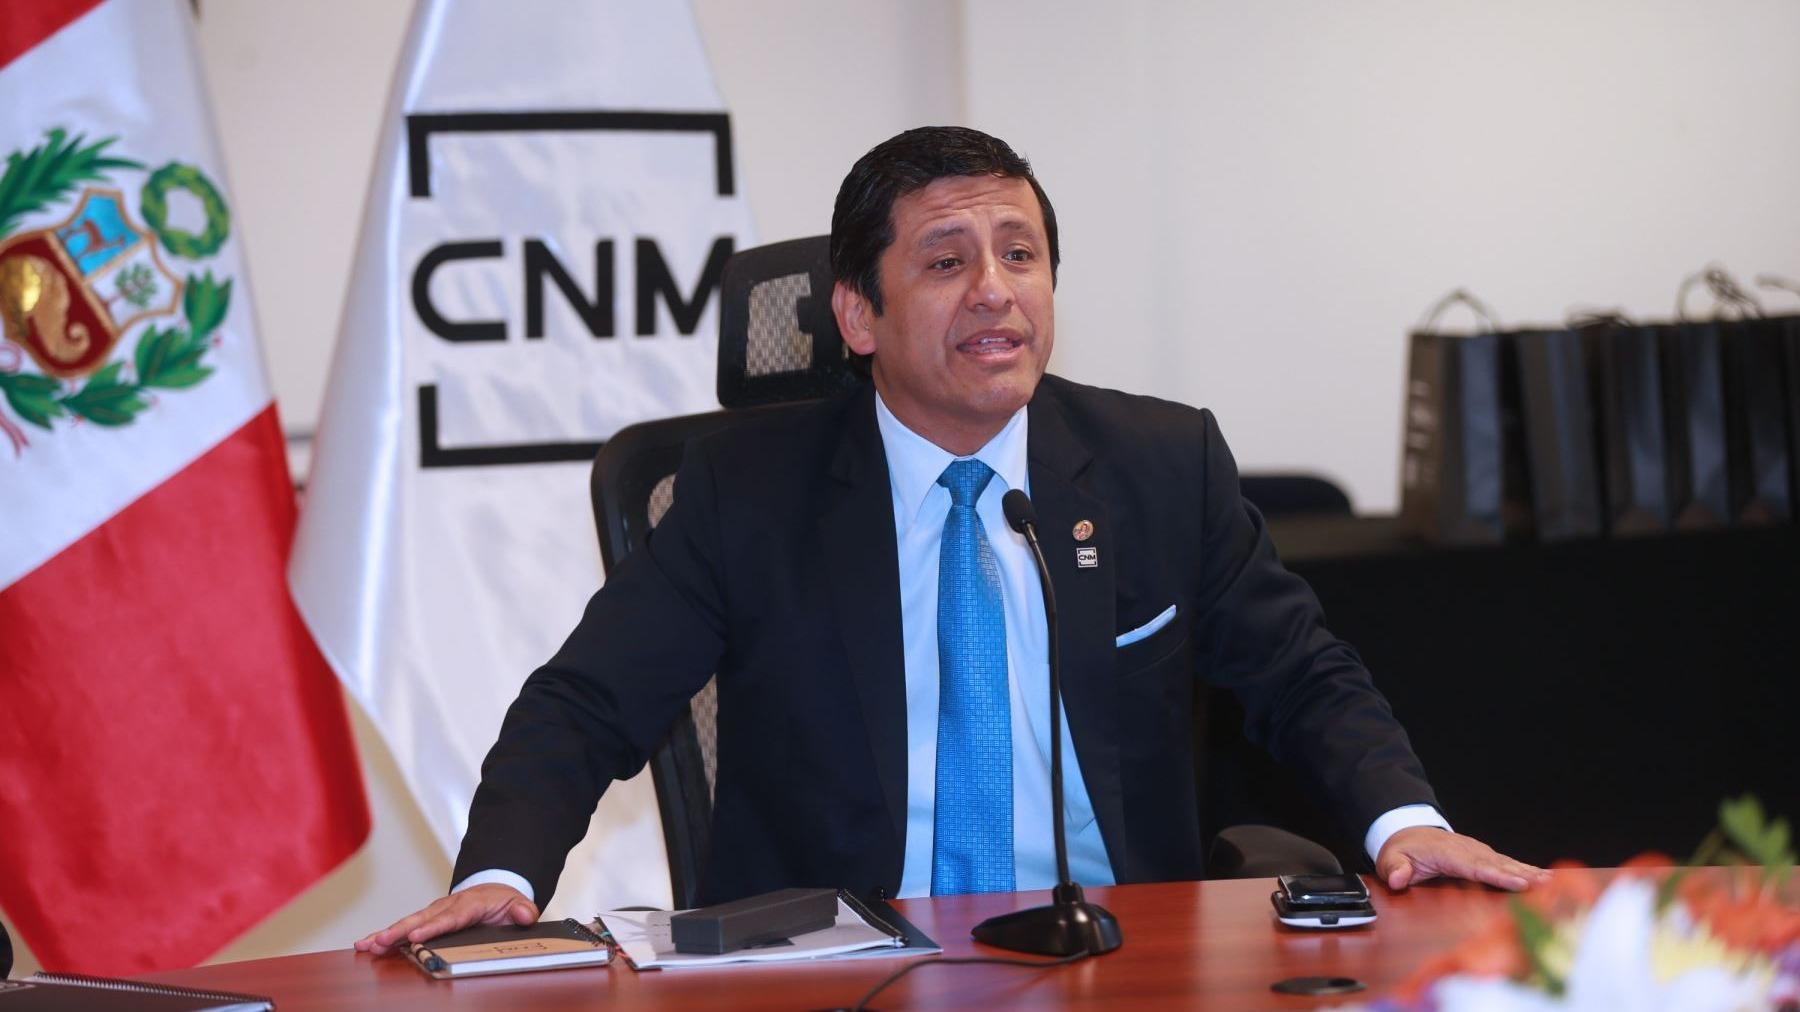 Aprueban denuncia constitucional contra expresidente del desactivado CNM.